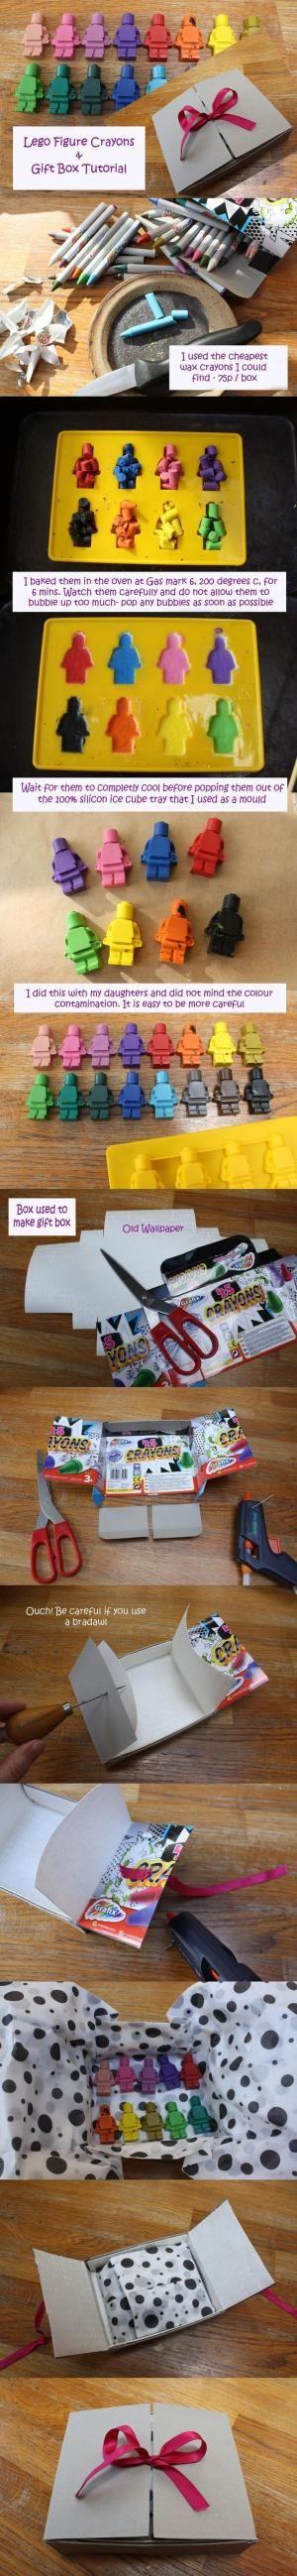 Make It: Lego Man Crayos - Tutorial #kids by Divonsir Borges